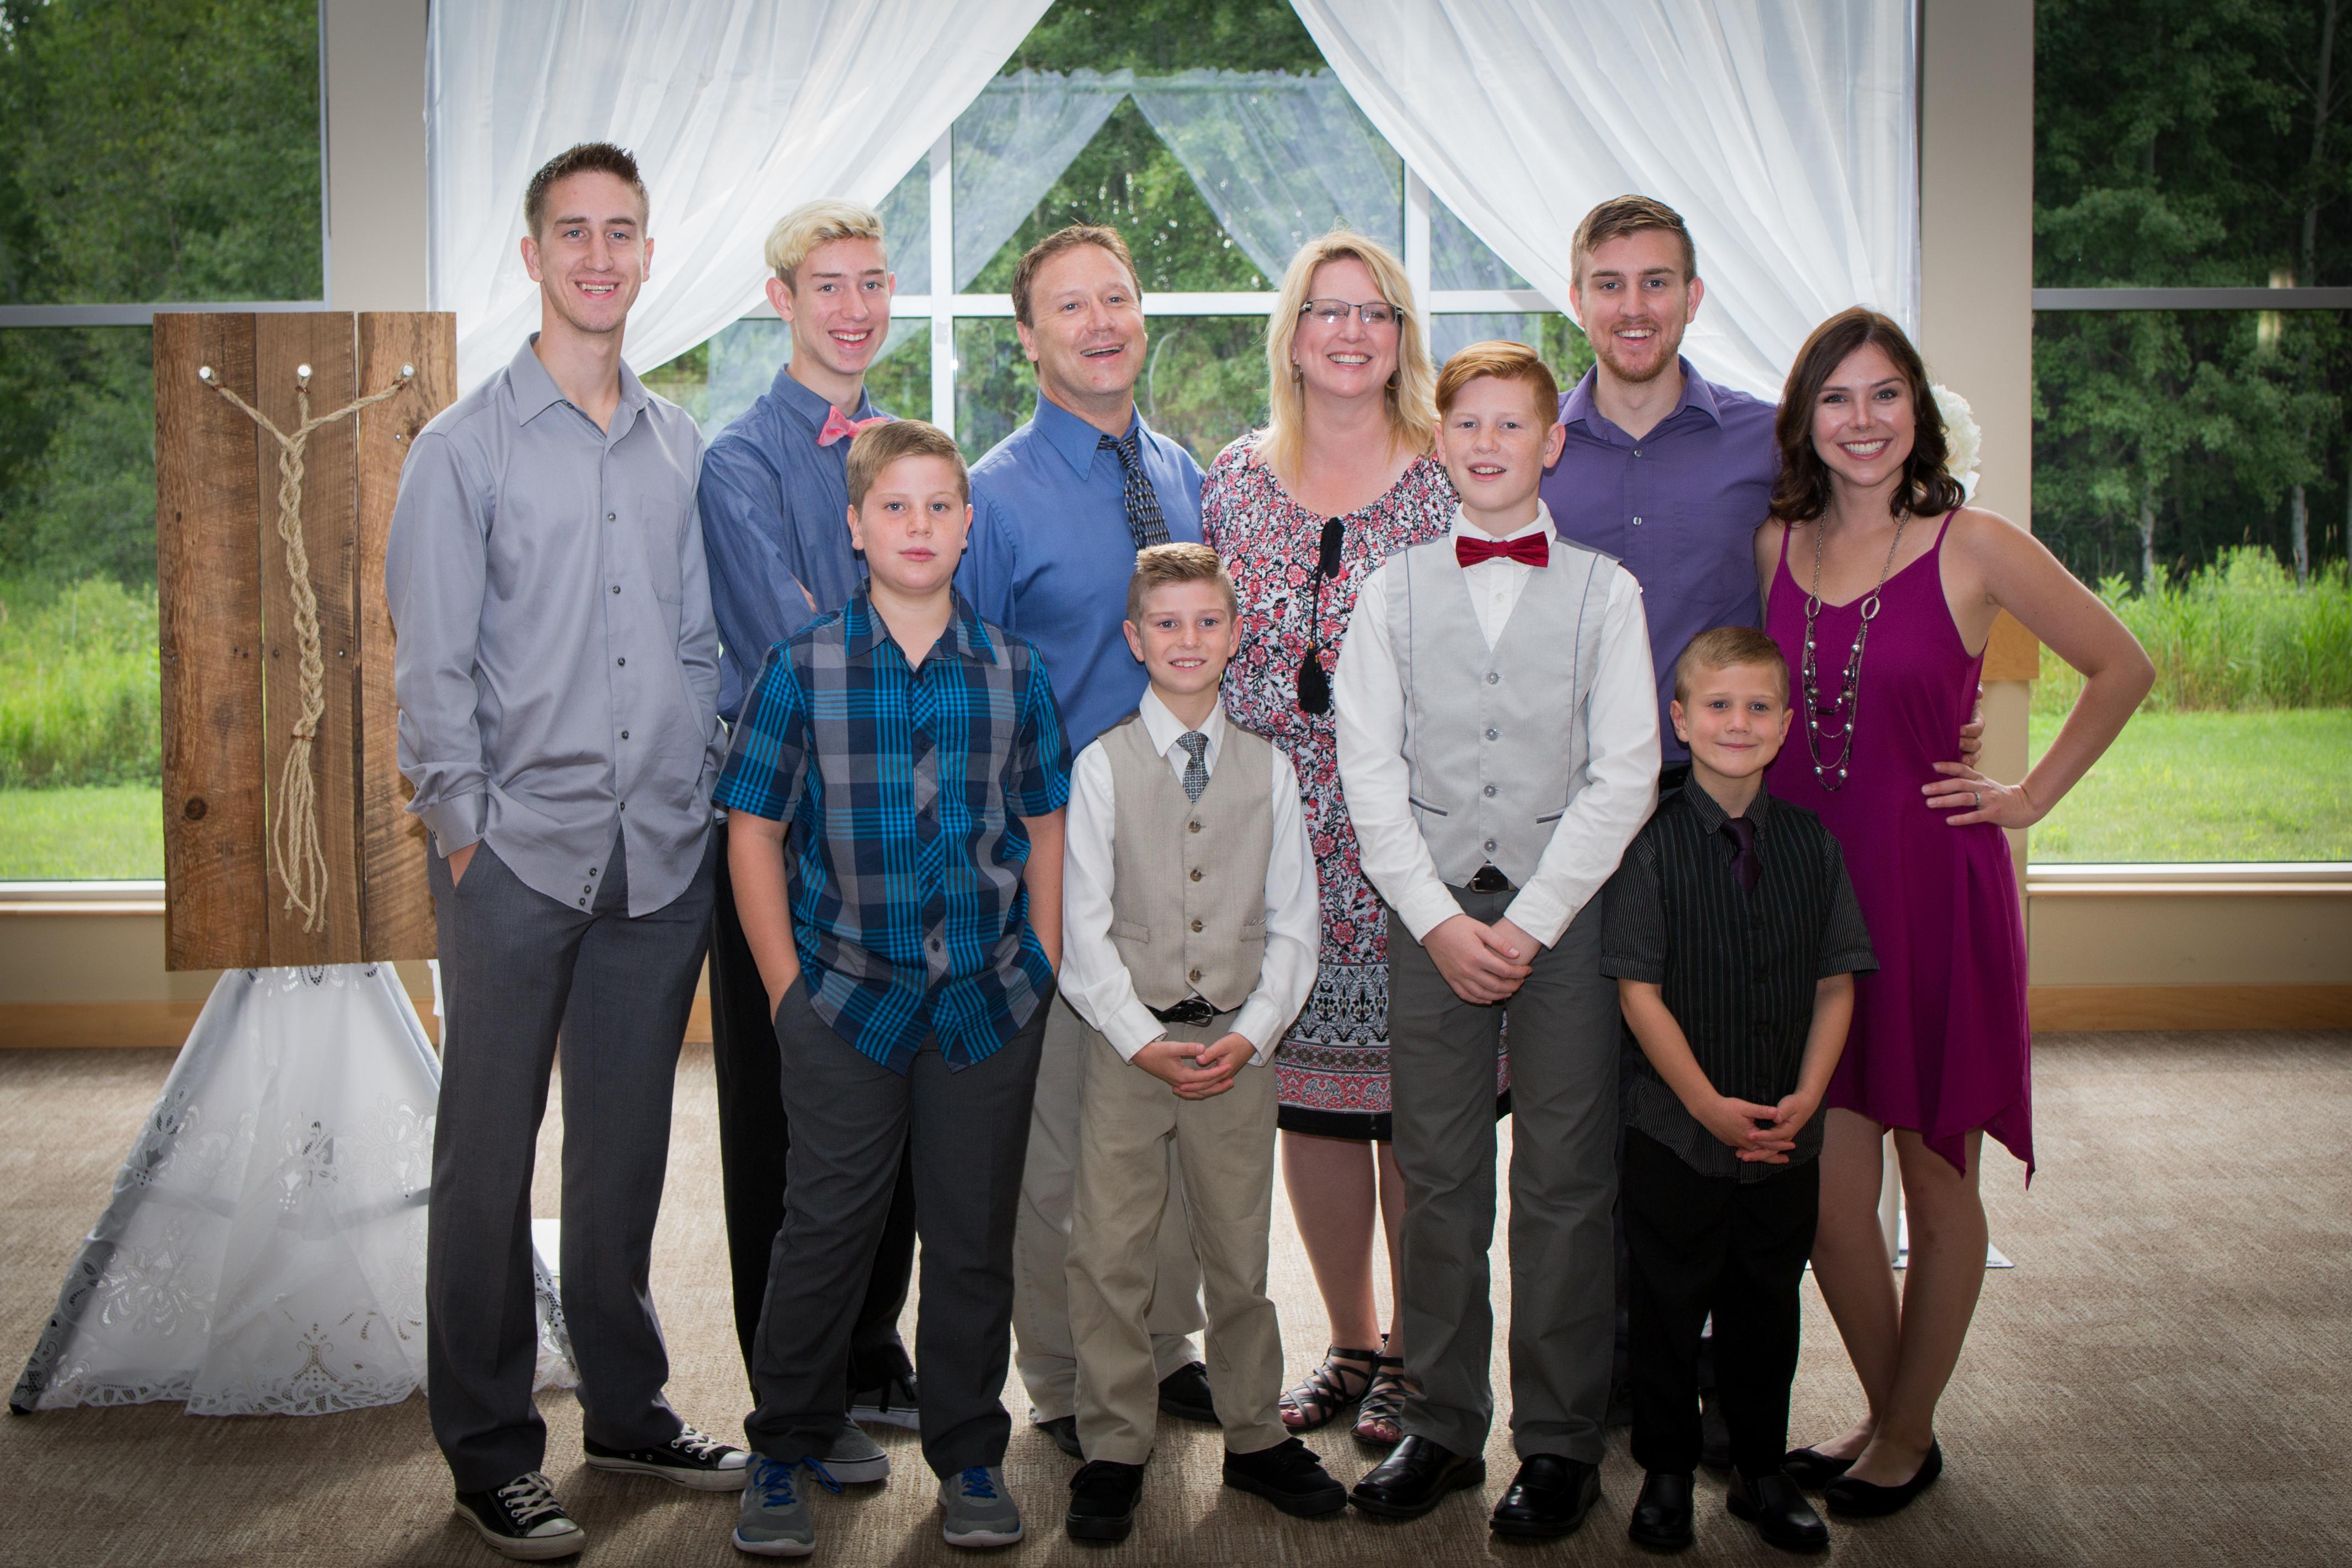 Family%20pic%20katies%20wedding original